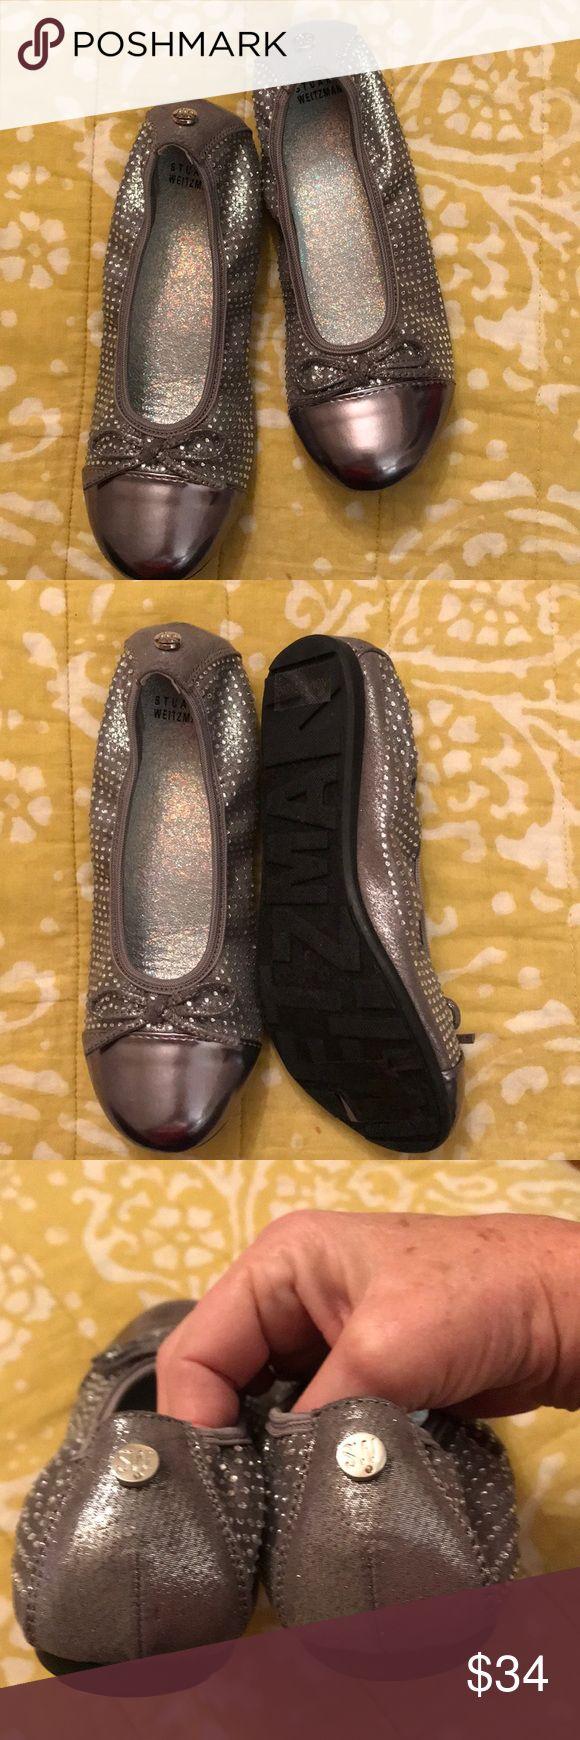 Shoe New Stuart Wiseman little girls ballet flats sparkles on them and their size 2 Stuart Weitzman Shoes #stuartweitzmanflats